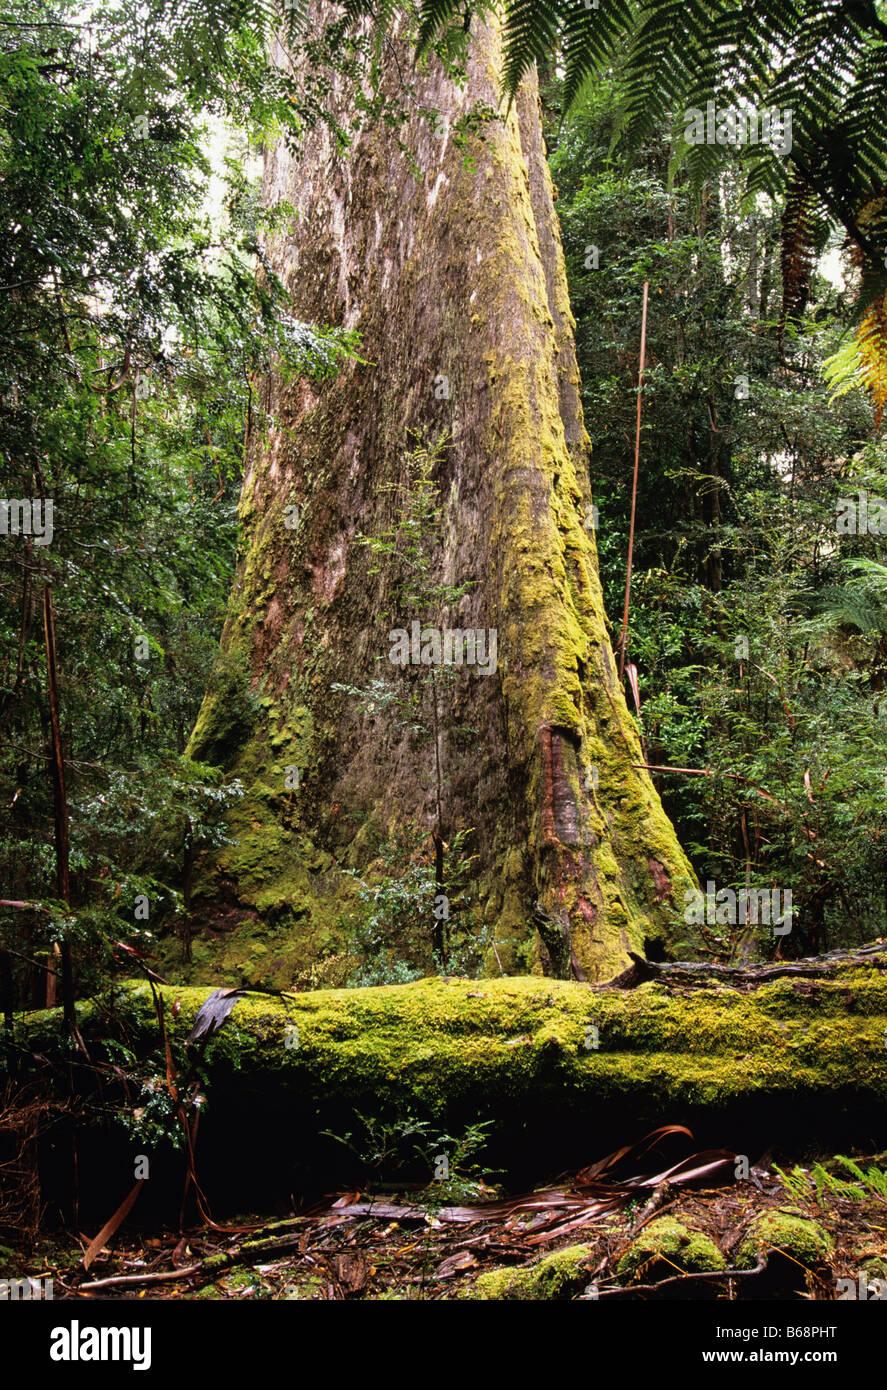 Swamp Gum Eucalyptus regnans Photographed in Styx Valley Tasmania, Australia - Stock Image